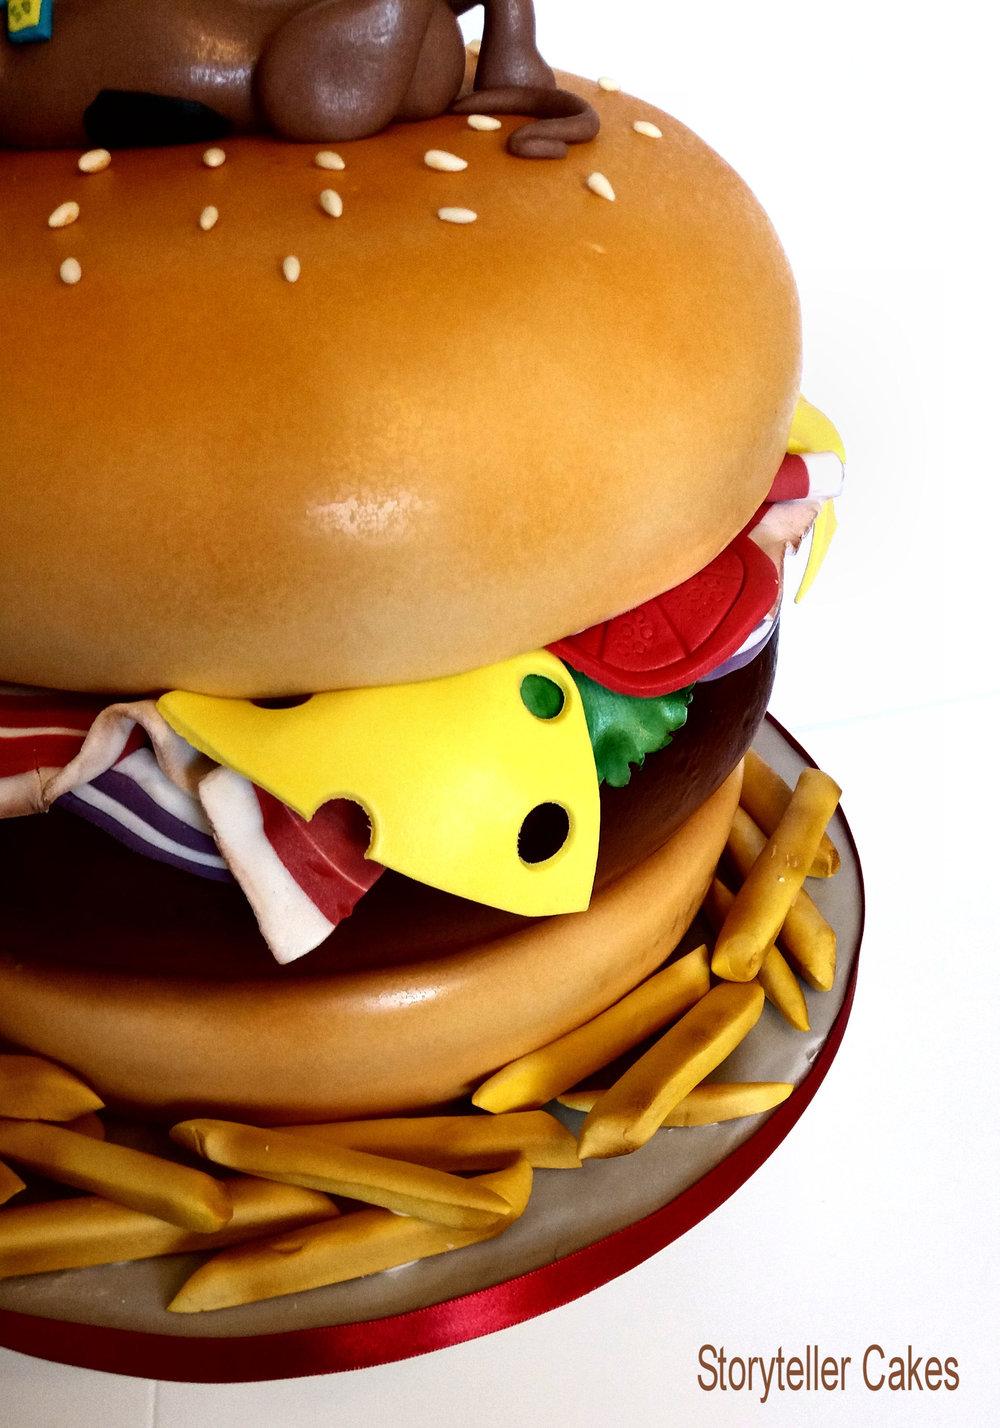 Scooby Doo Burger Cake3.jpg